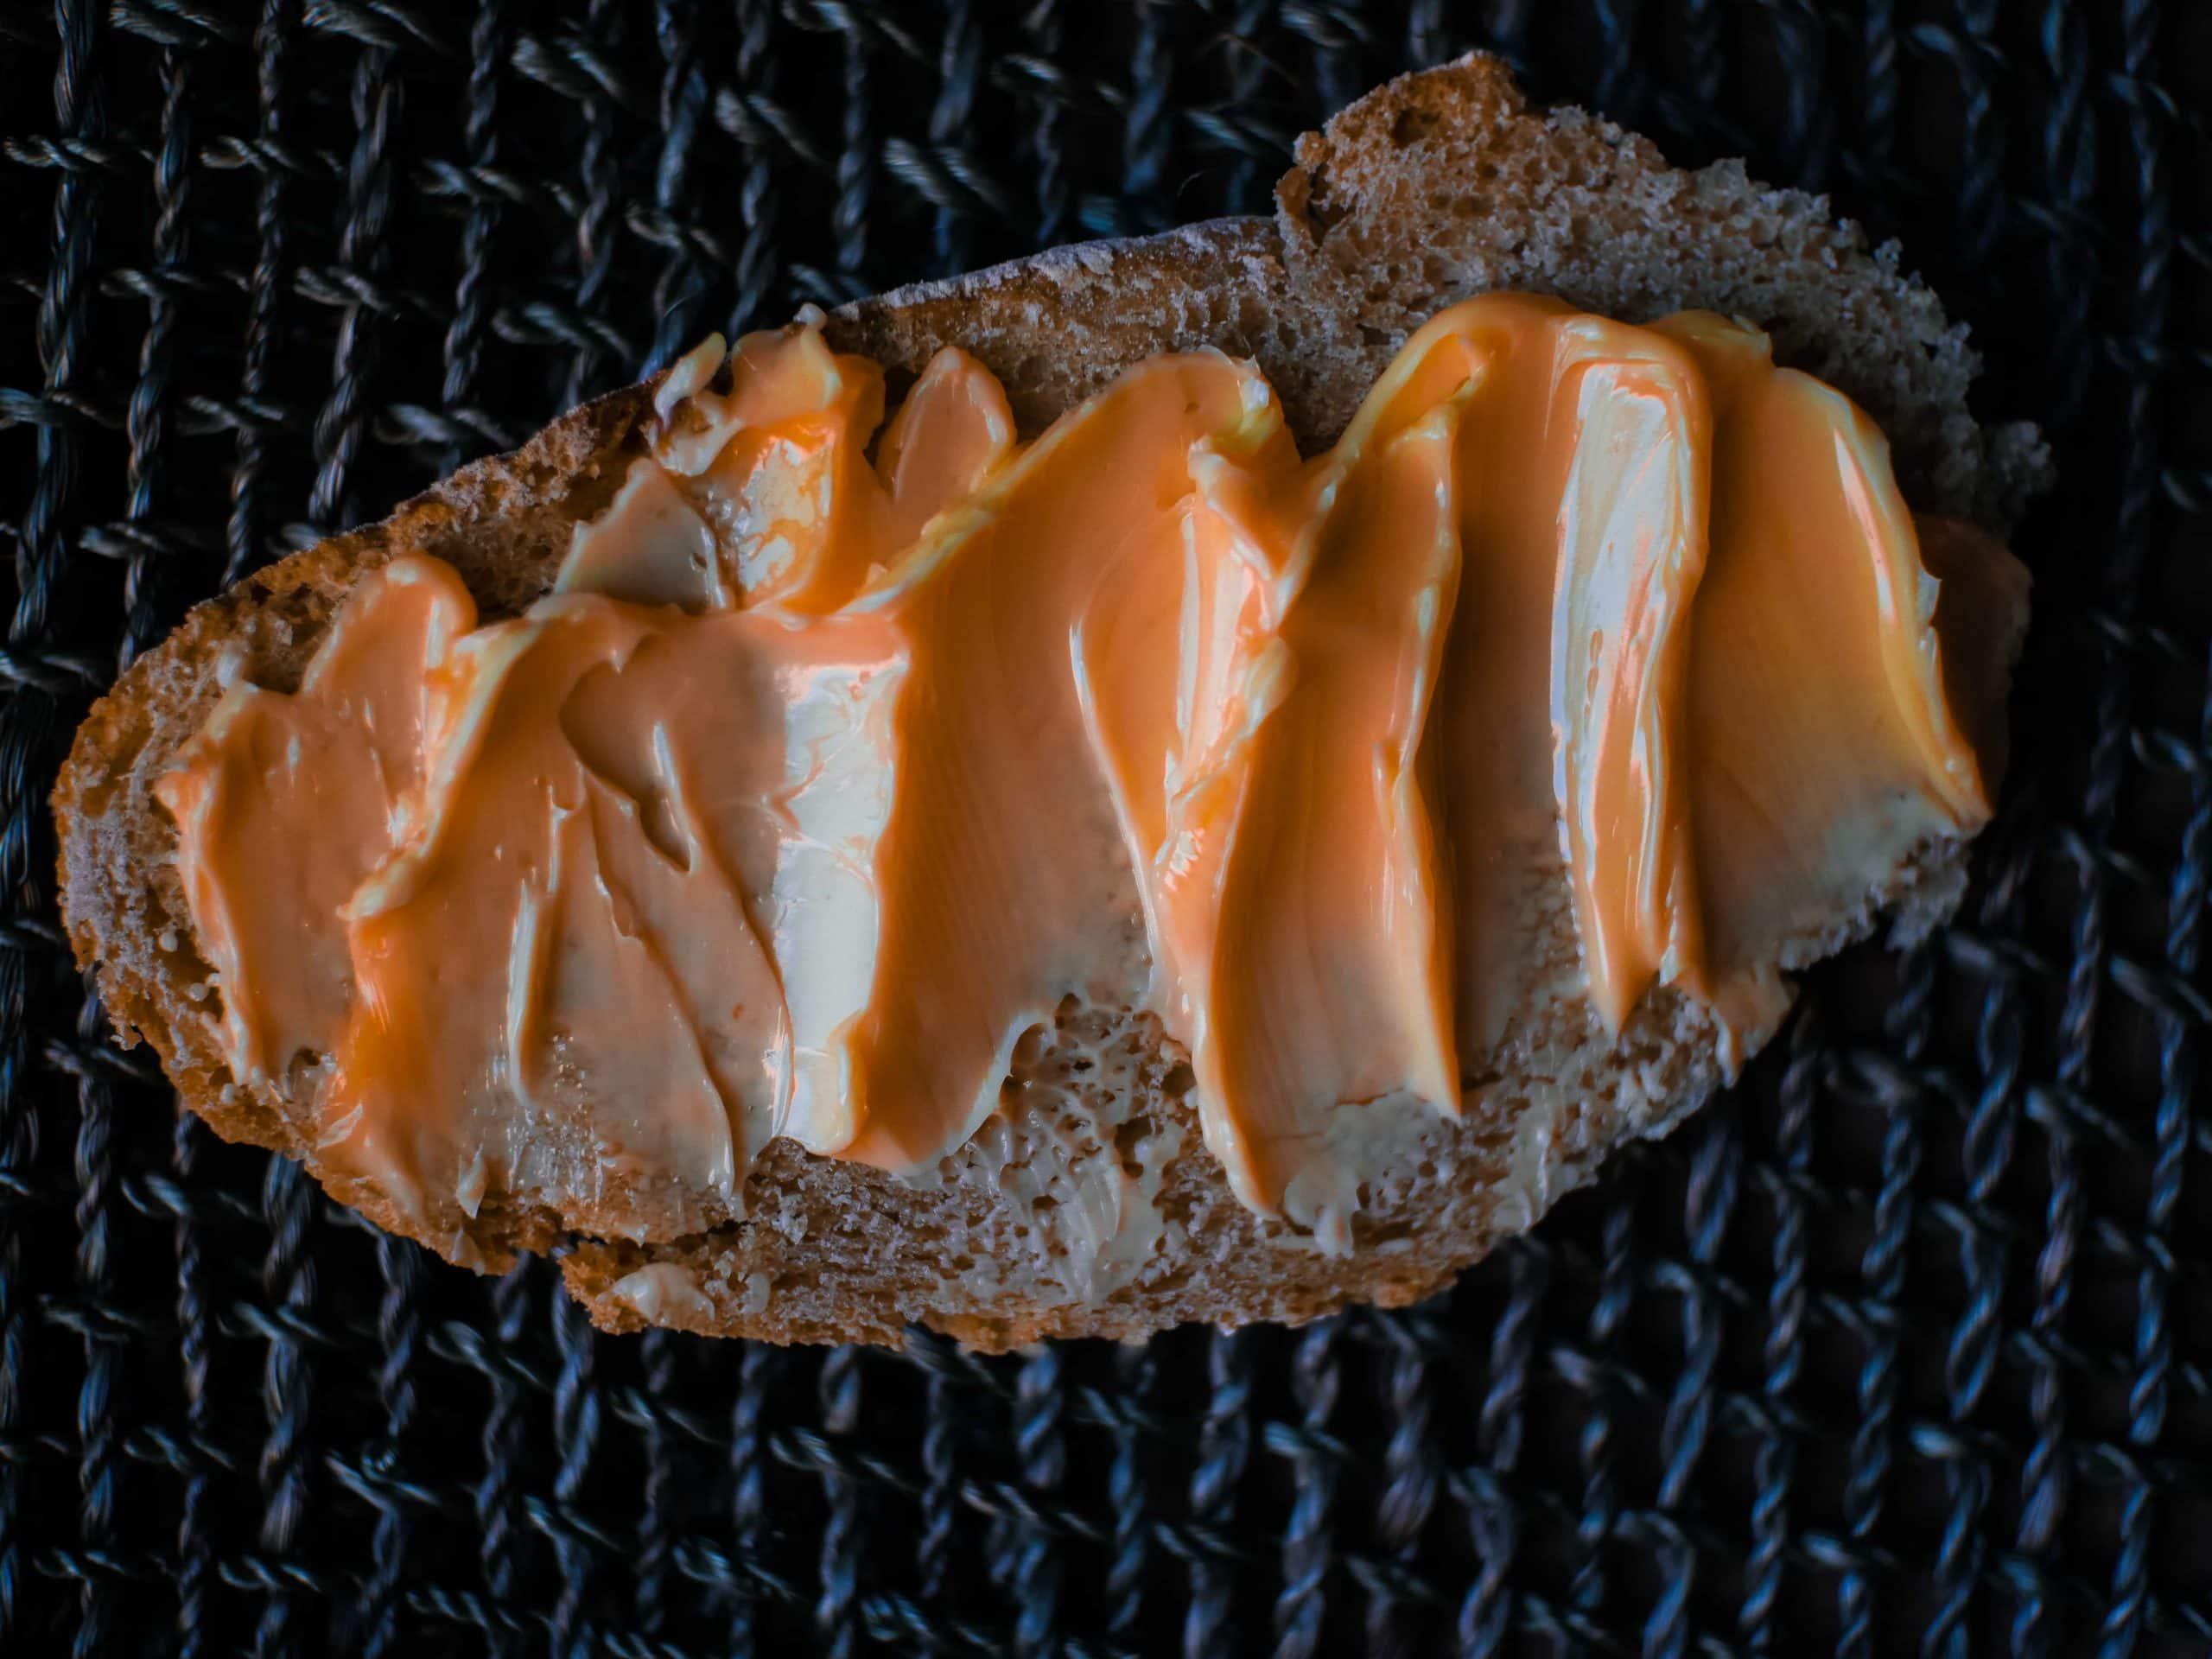 raw cultured butter on einkorn sourdough bread